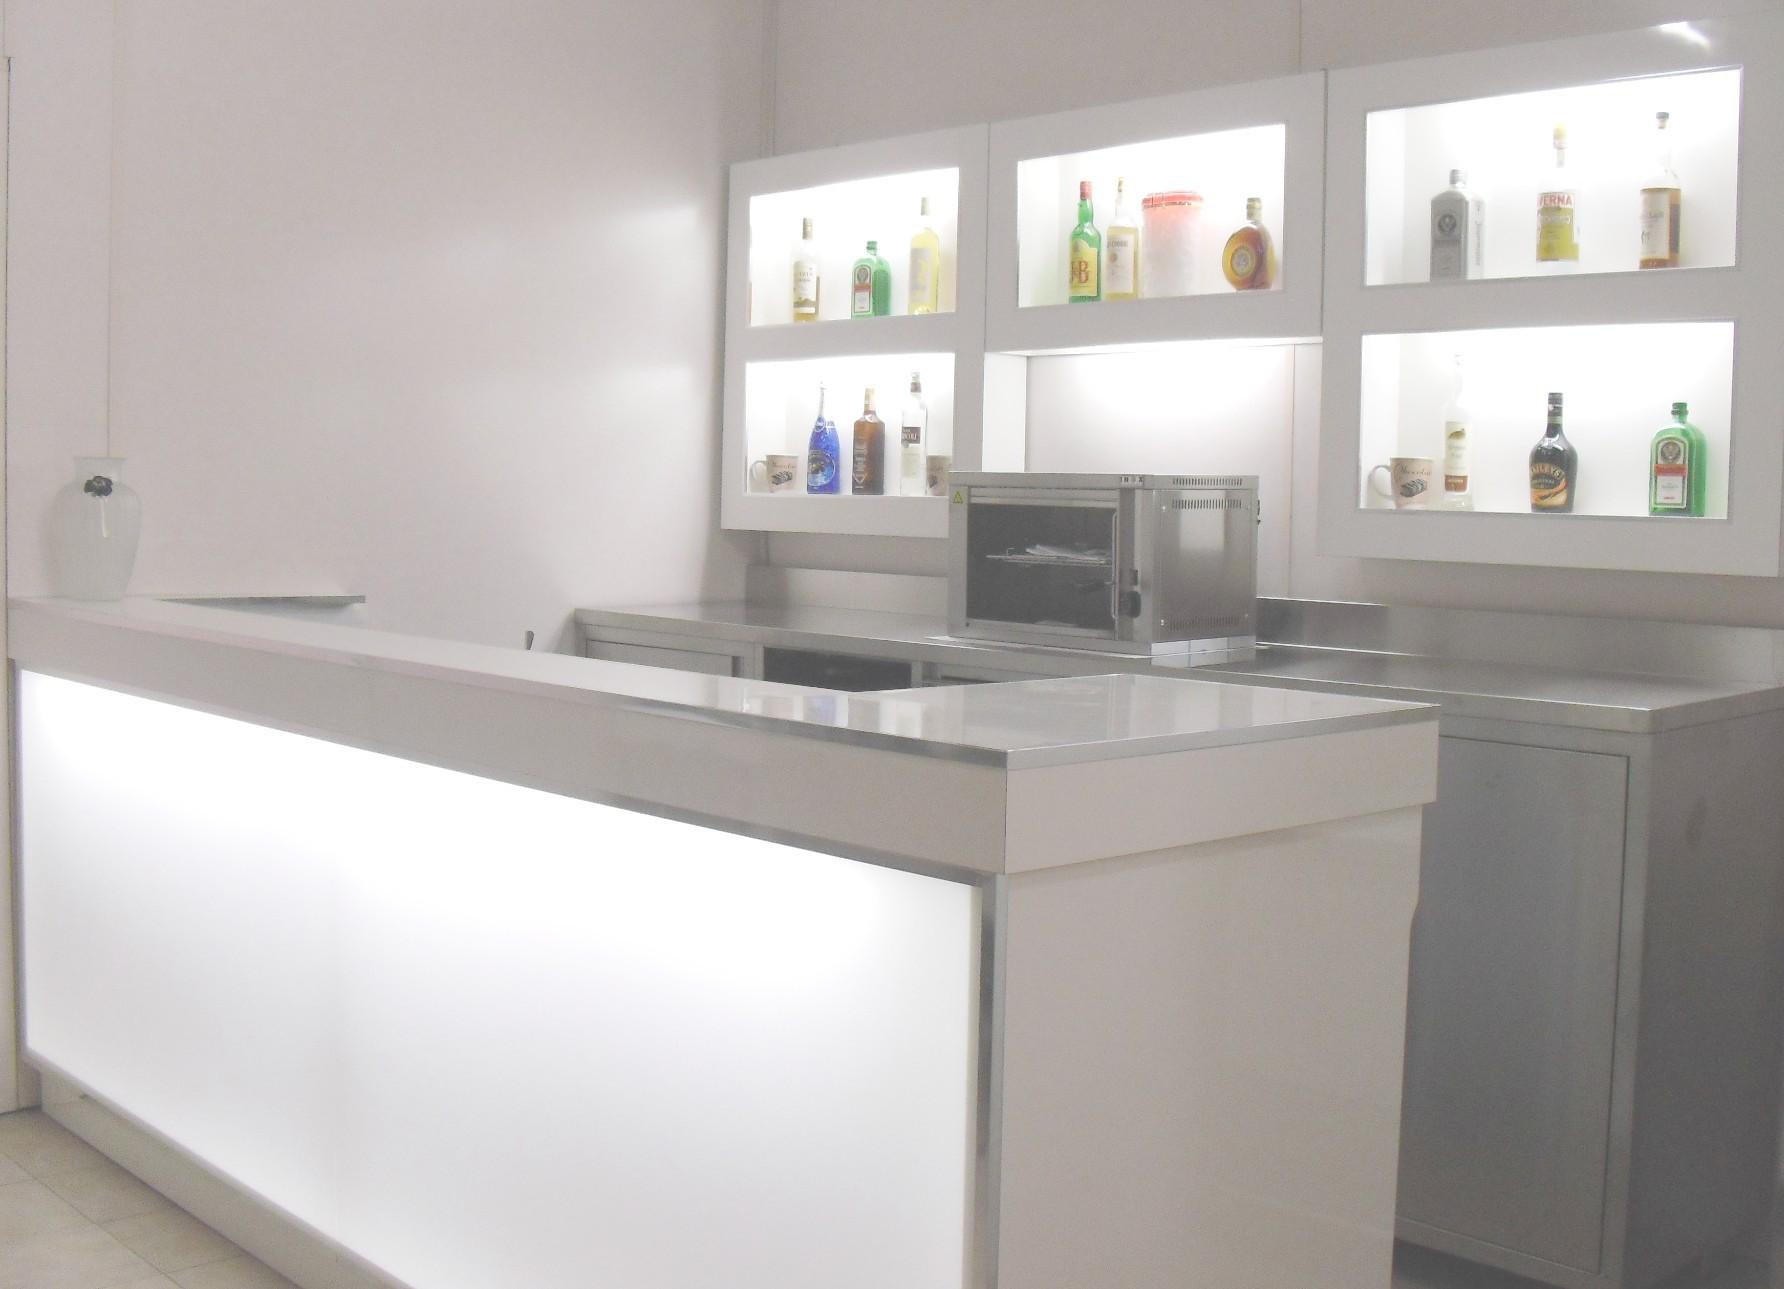 Banchi bar compra in fabbrica banconi bar banconi frigo for Arredamenti bar prezzi